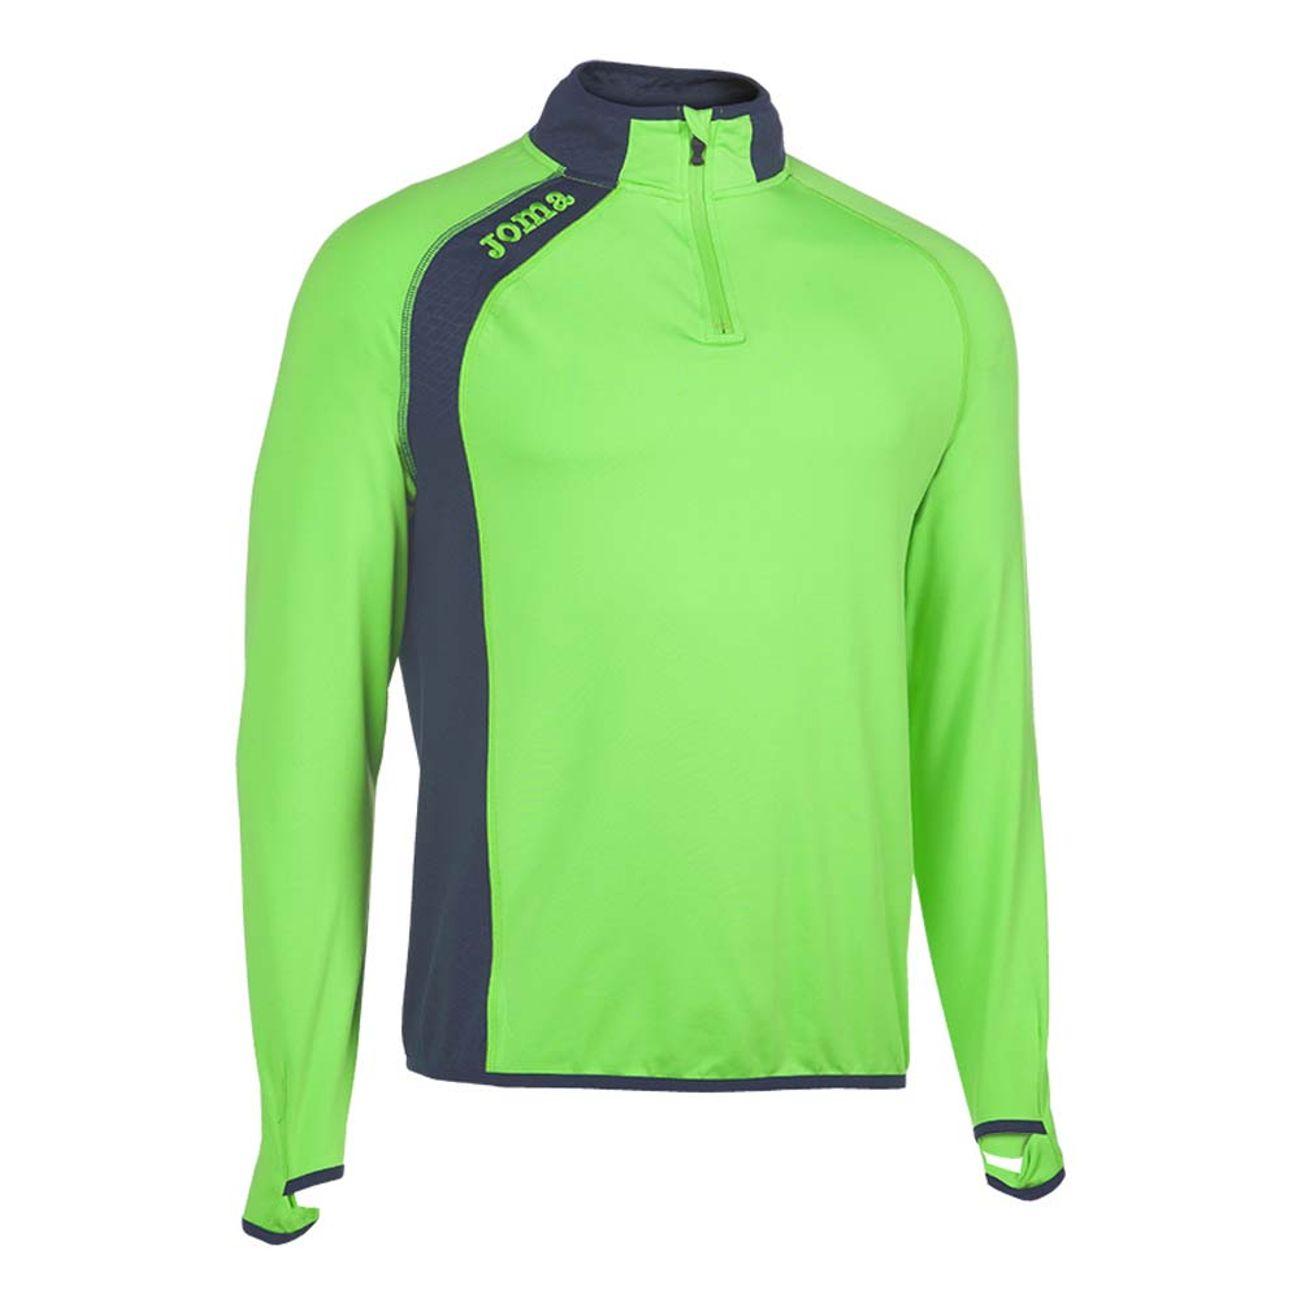 Zipper Joma V Running 2 Homme 1 Sweatshirt Elite 7Yg6byf